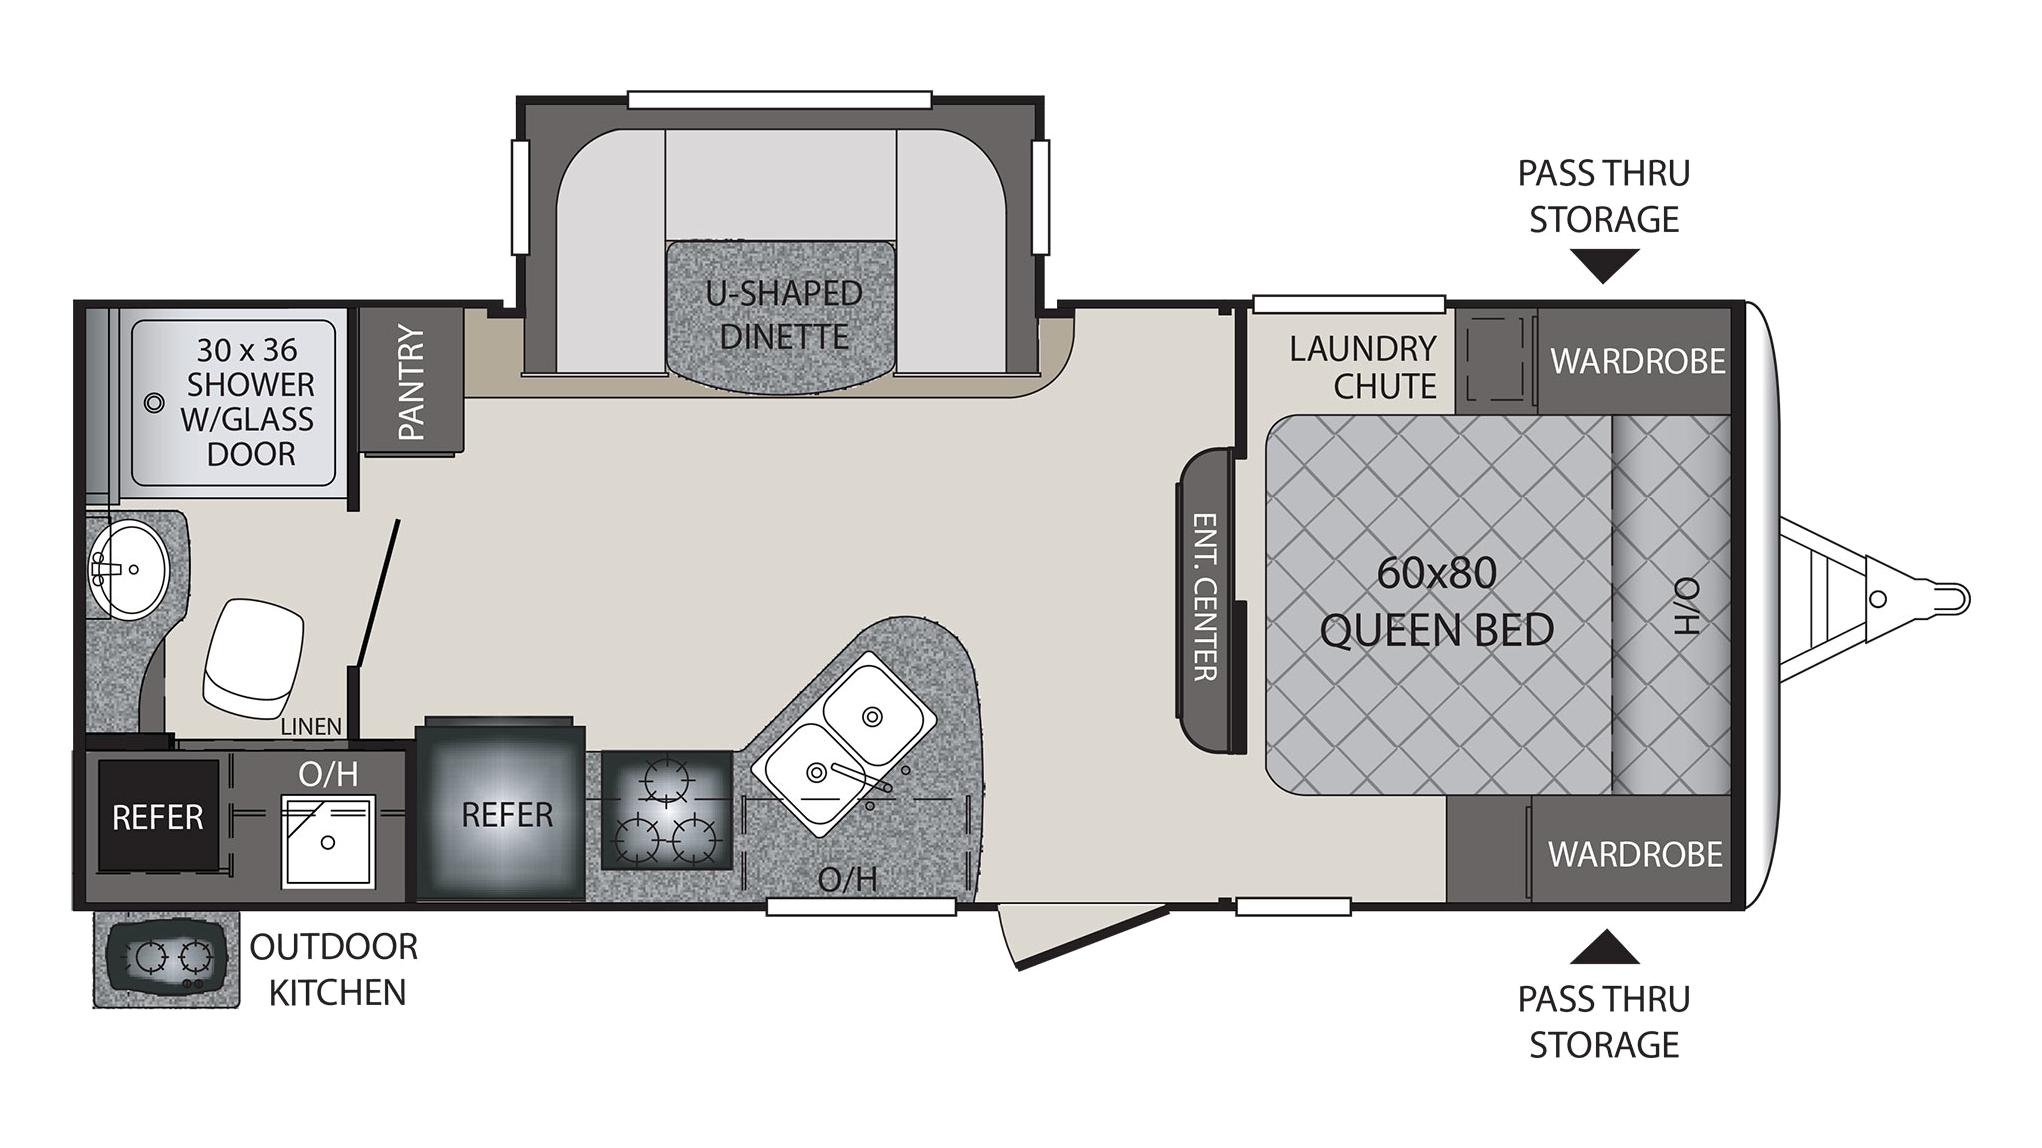 Keystone Bullet Rv Floor Plans: 2018 Keystone Premier 22RBPR Camper